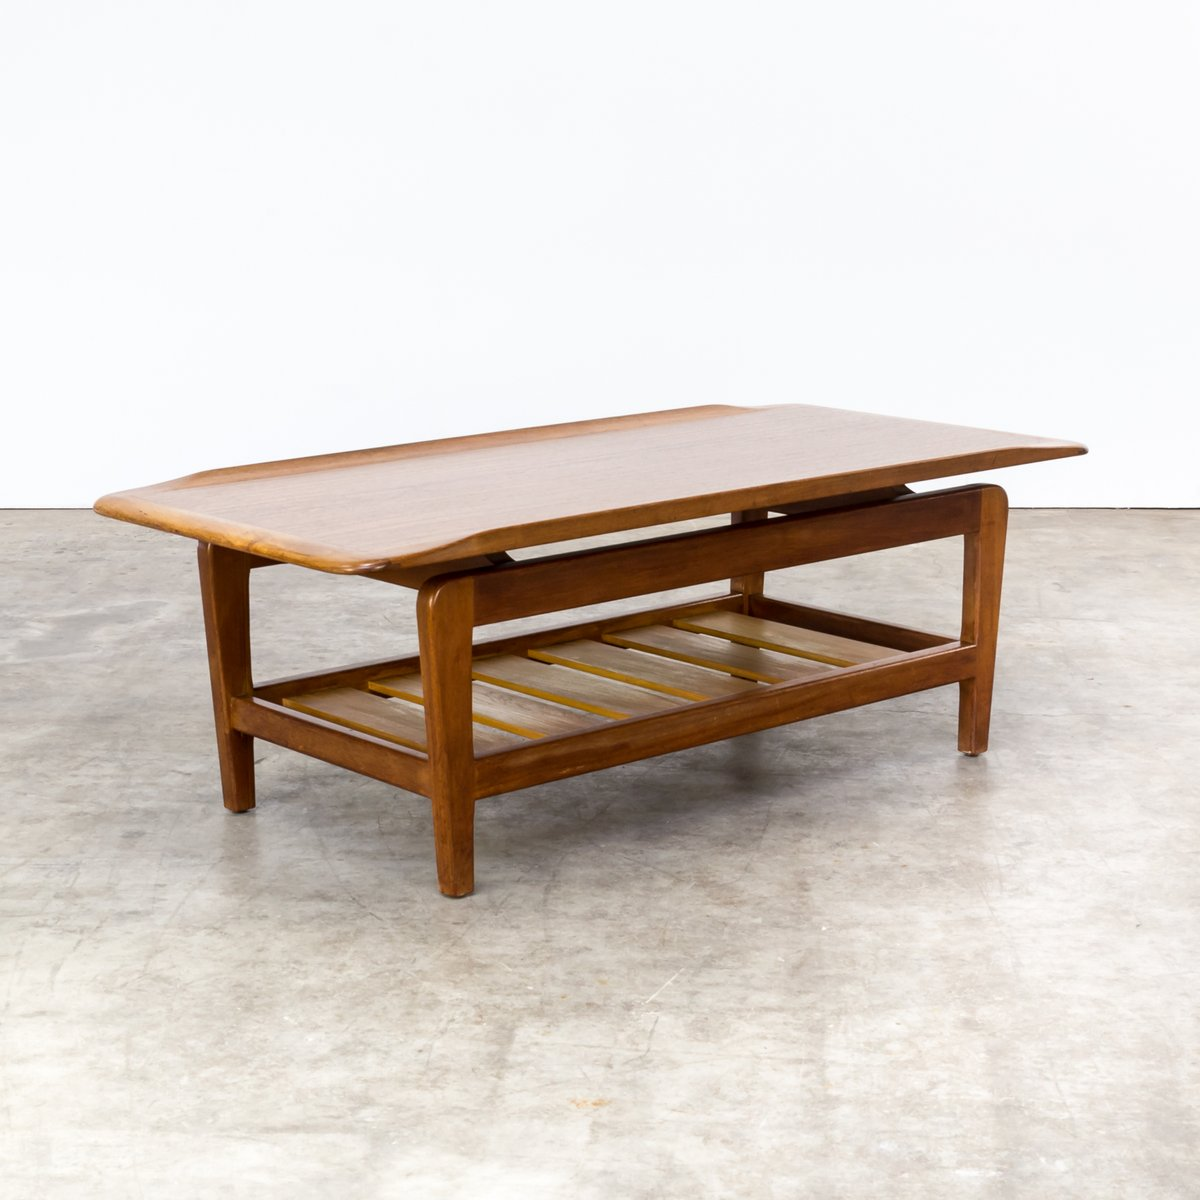 Large Danish Coffee Table, 1960s